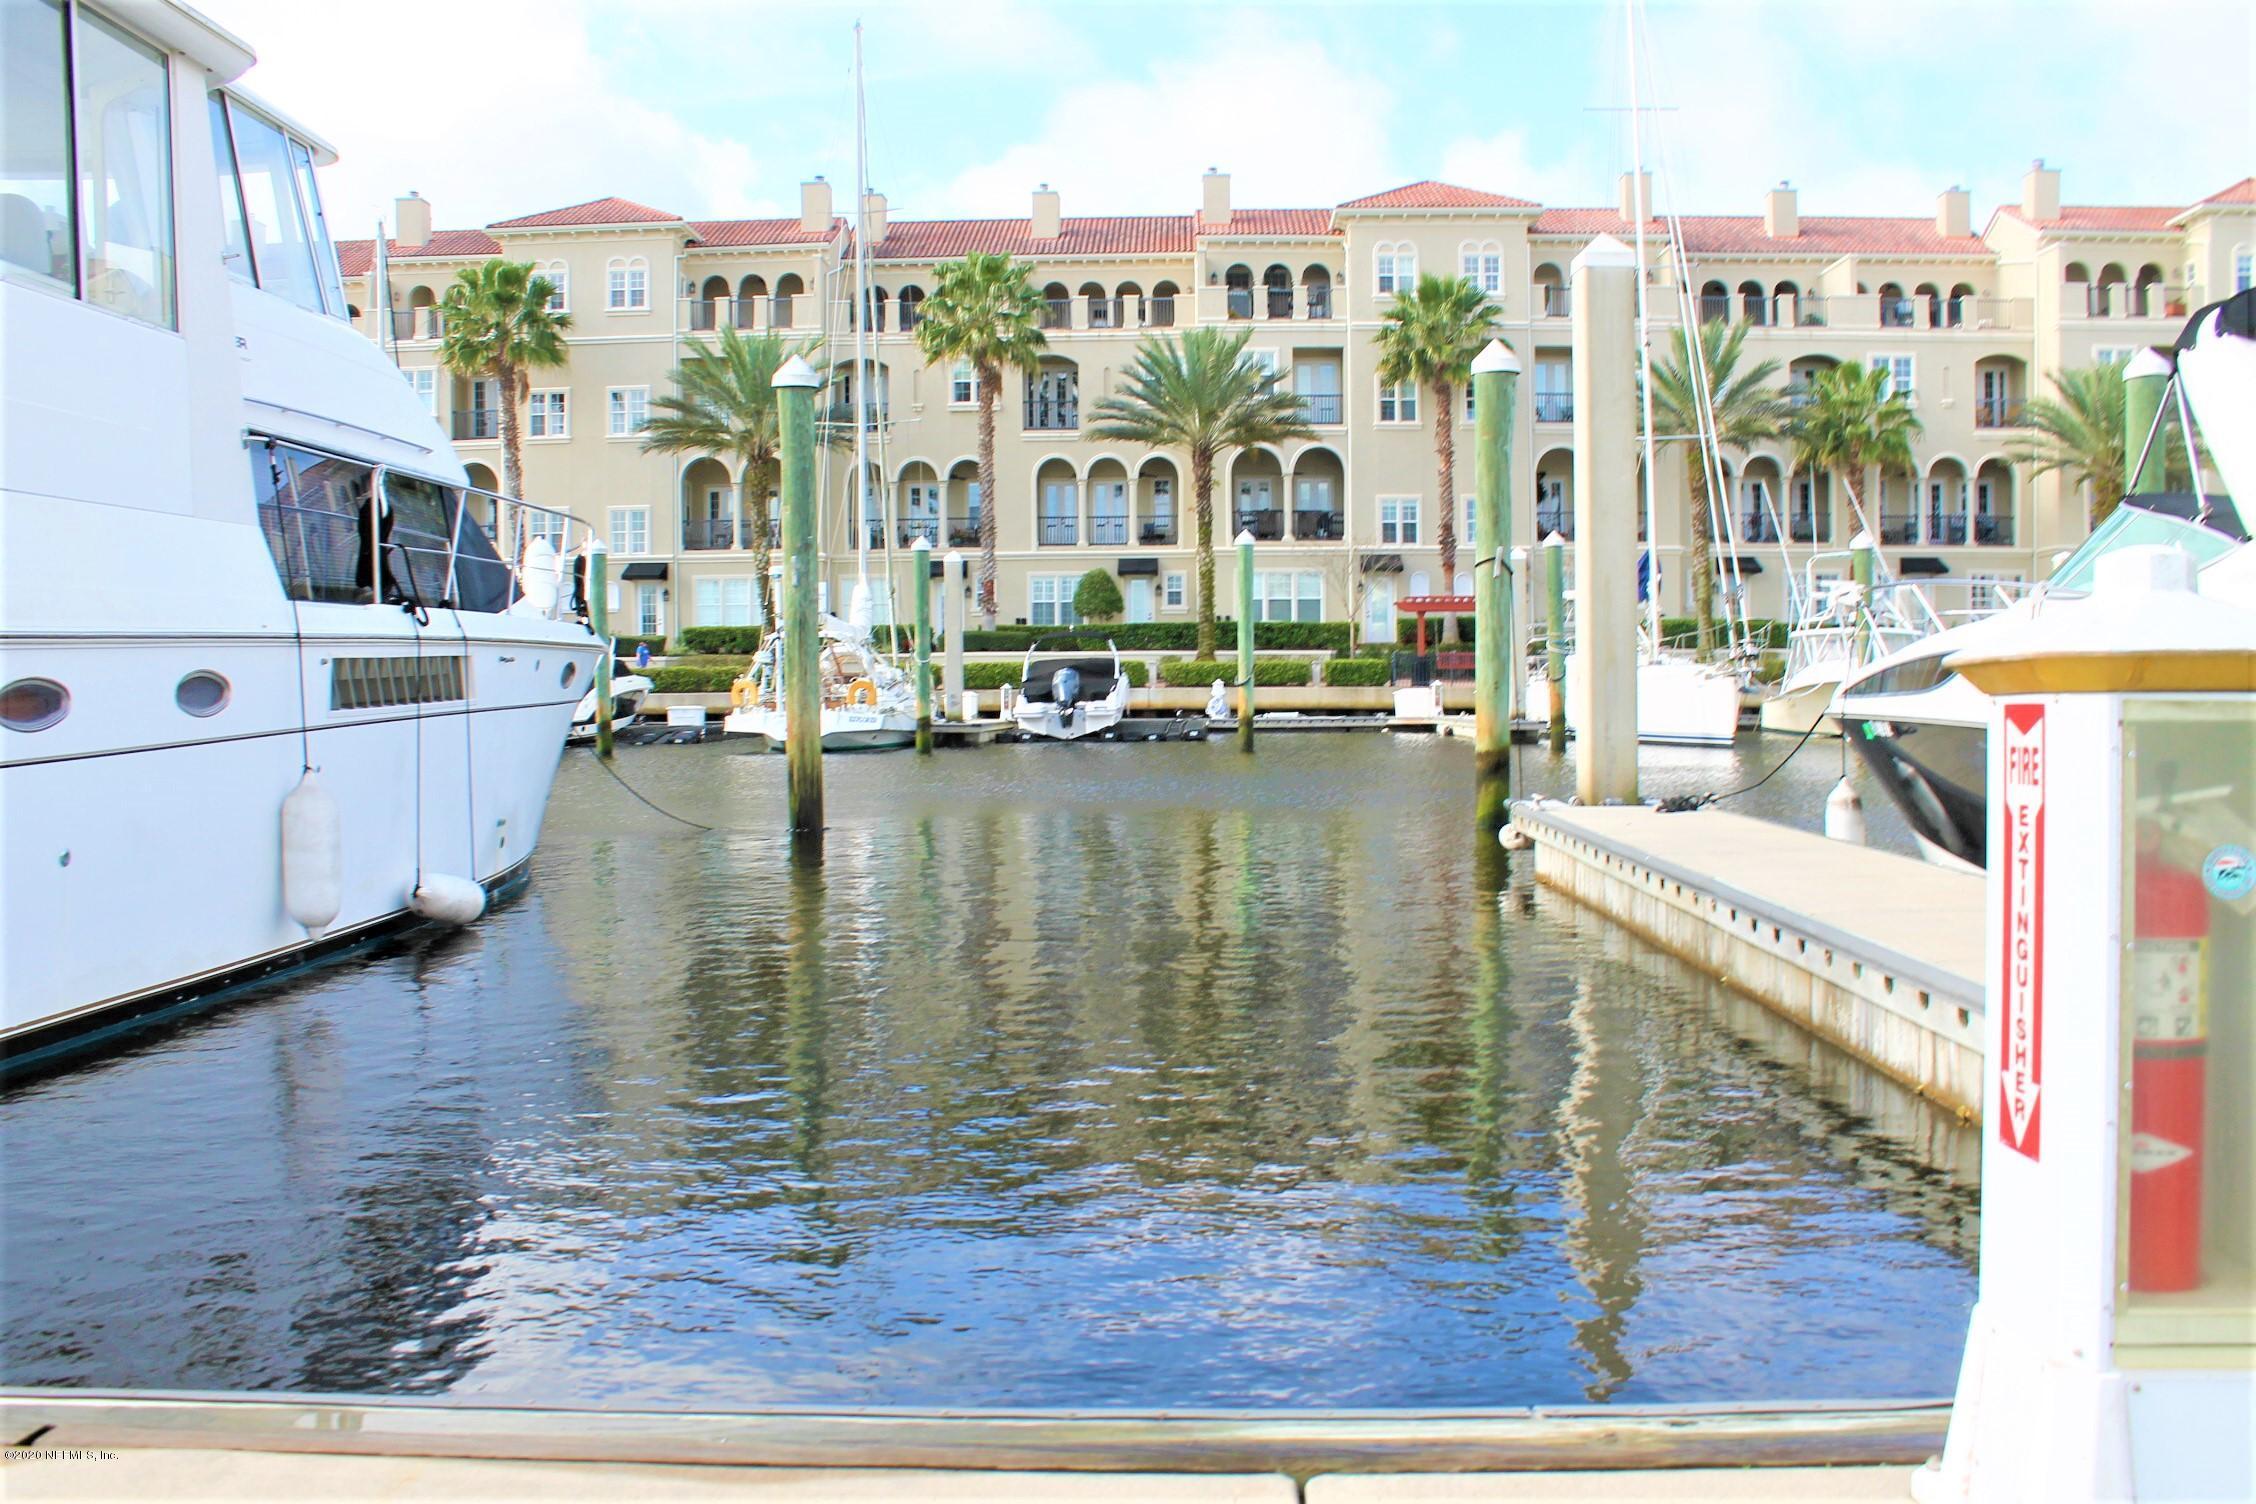 0 ATLANTIC, JACKSONVILLE, FLORIDA 32225, 1 Bedroom Bedrooms, ,1 BathroomBathrooms,Residential,For sale,ATLANTIC,1038157